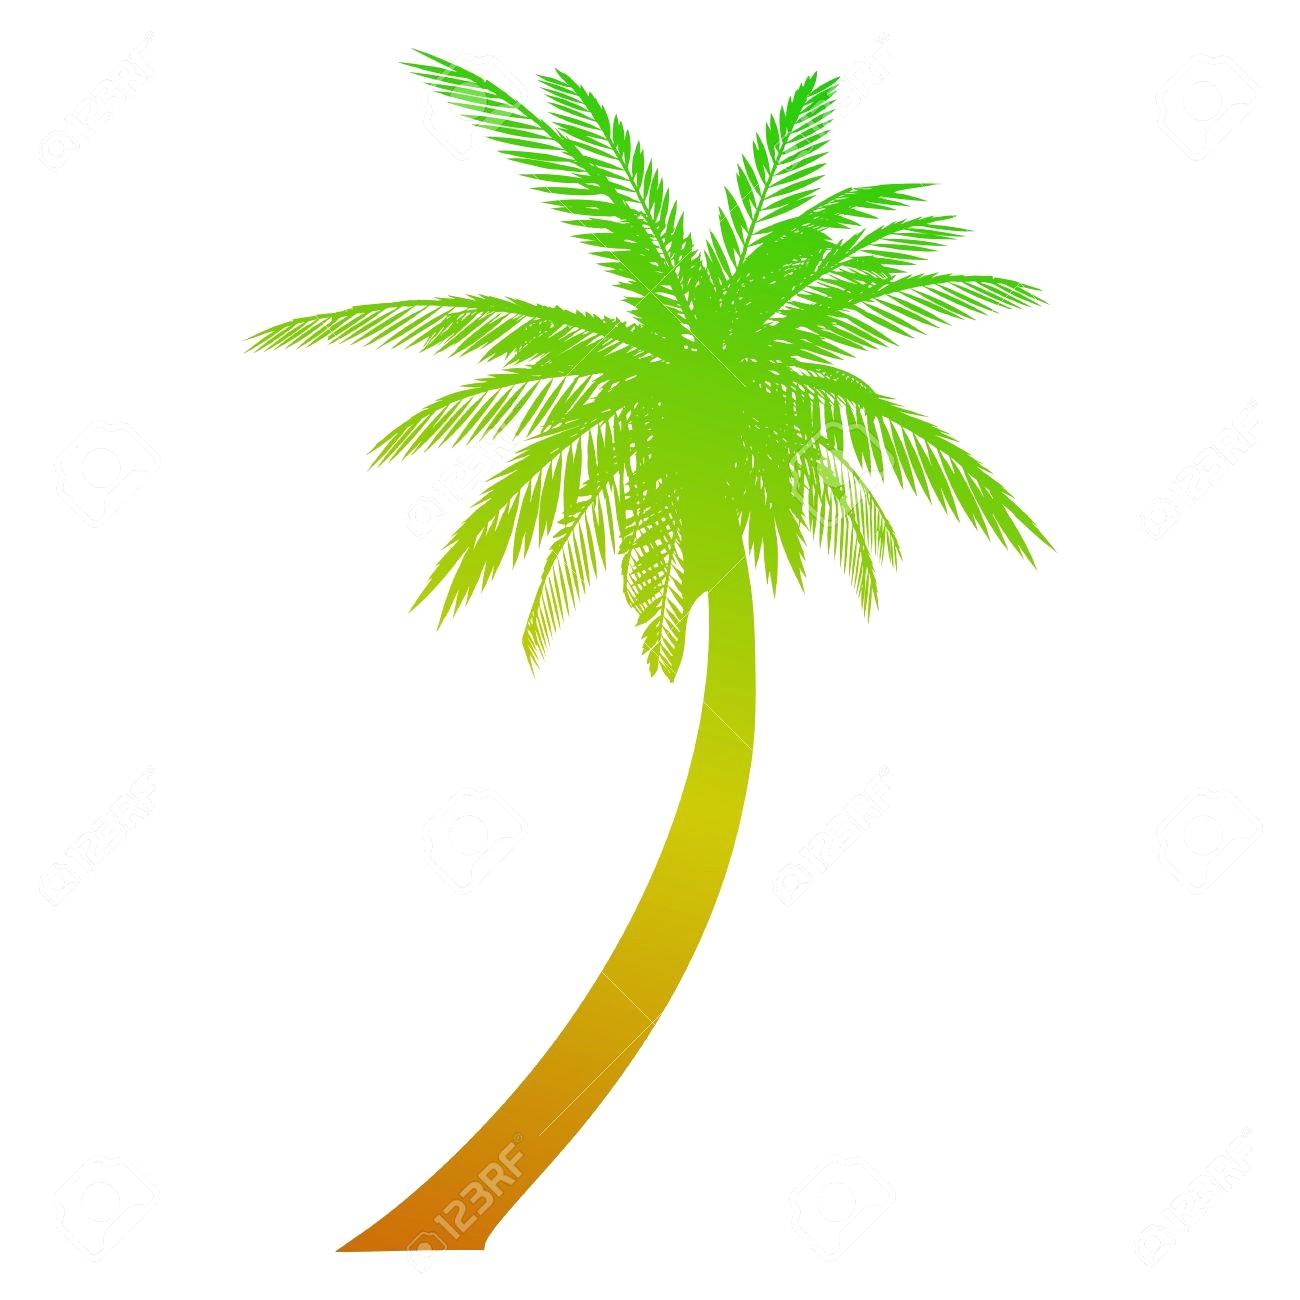 Palm tree pencil drawing free download best palm tree pencil